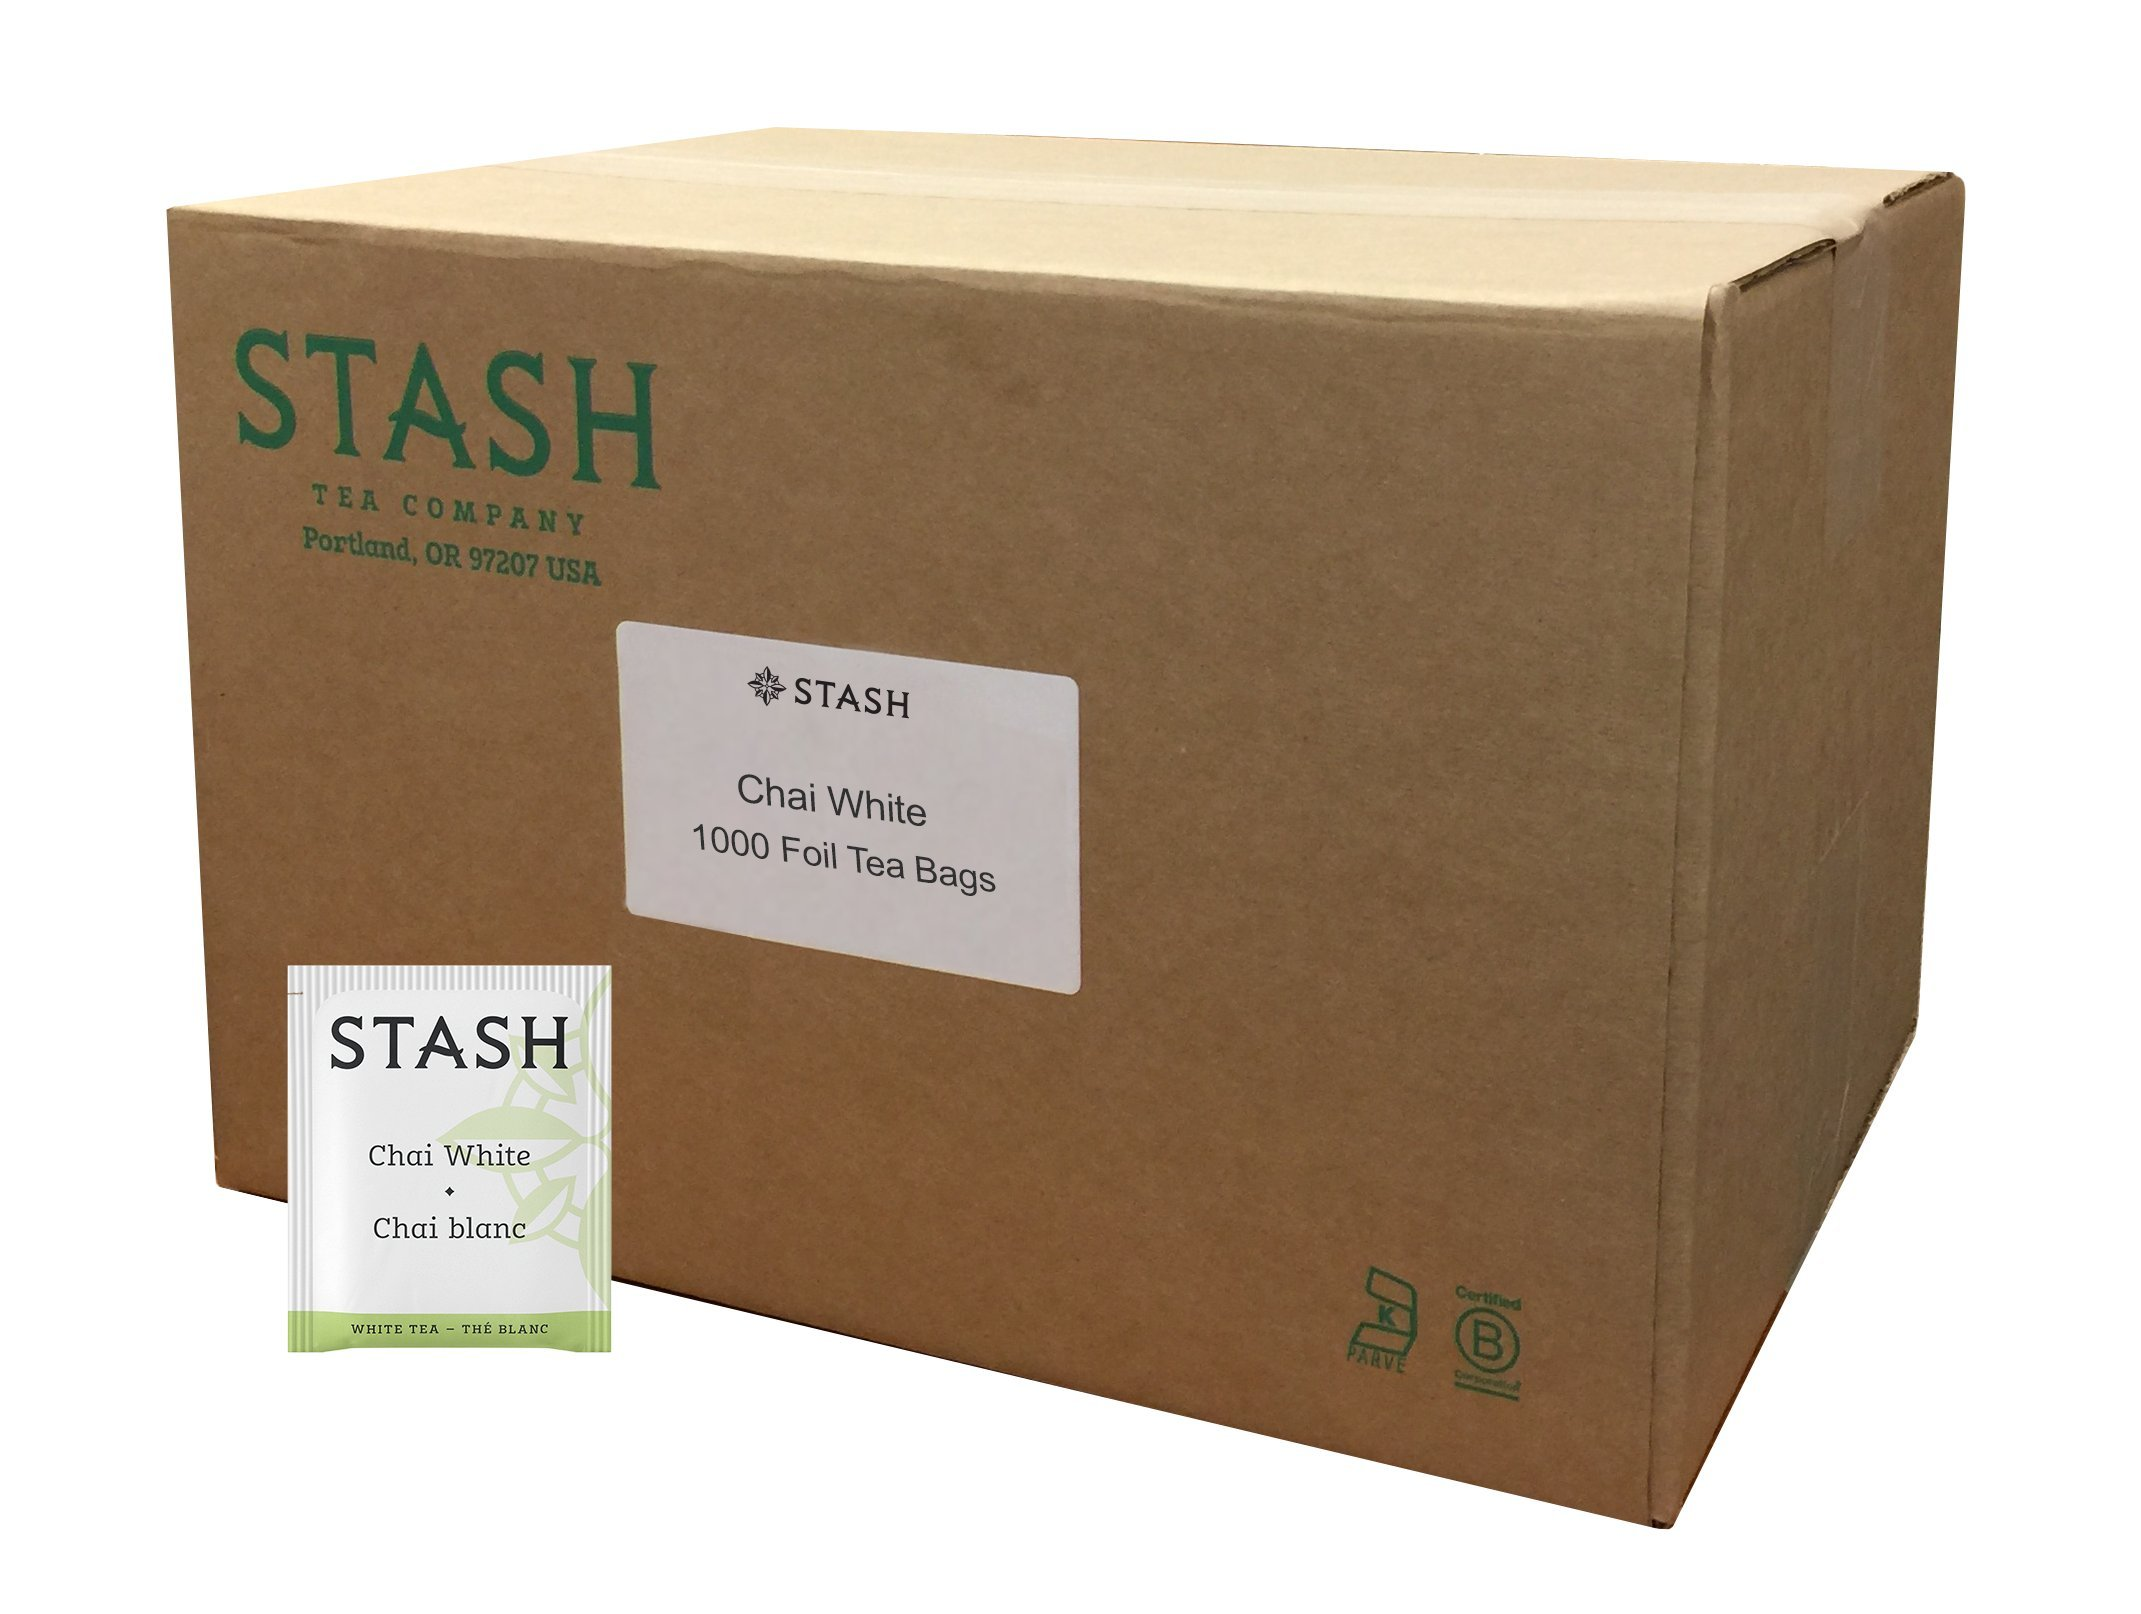 Stash Tea White Chai Tea 1000 Count Tea Bags in Foil Individual Spiced White Tea Bags for Use in Teapots Mugs or Cups, Brew Hot Tea or Iced Tea by Stash Tea (Image #1)